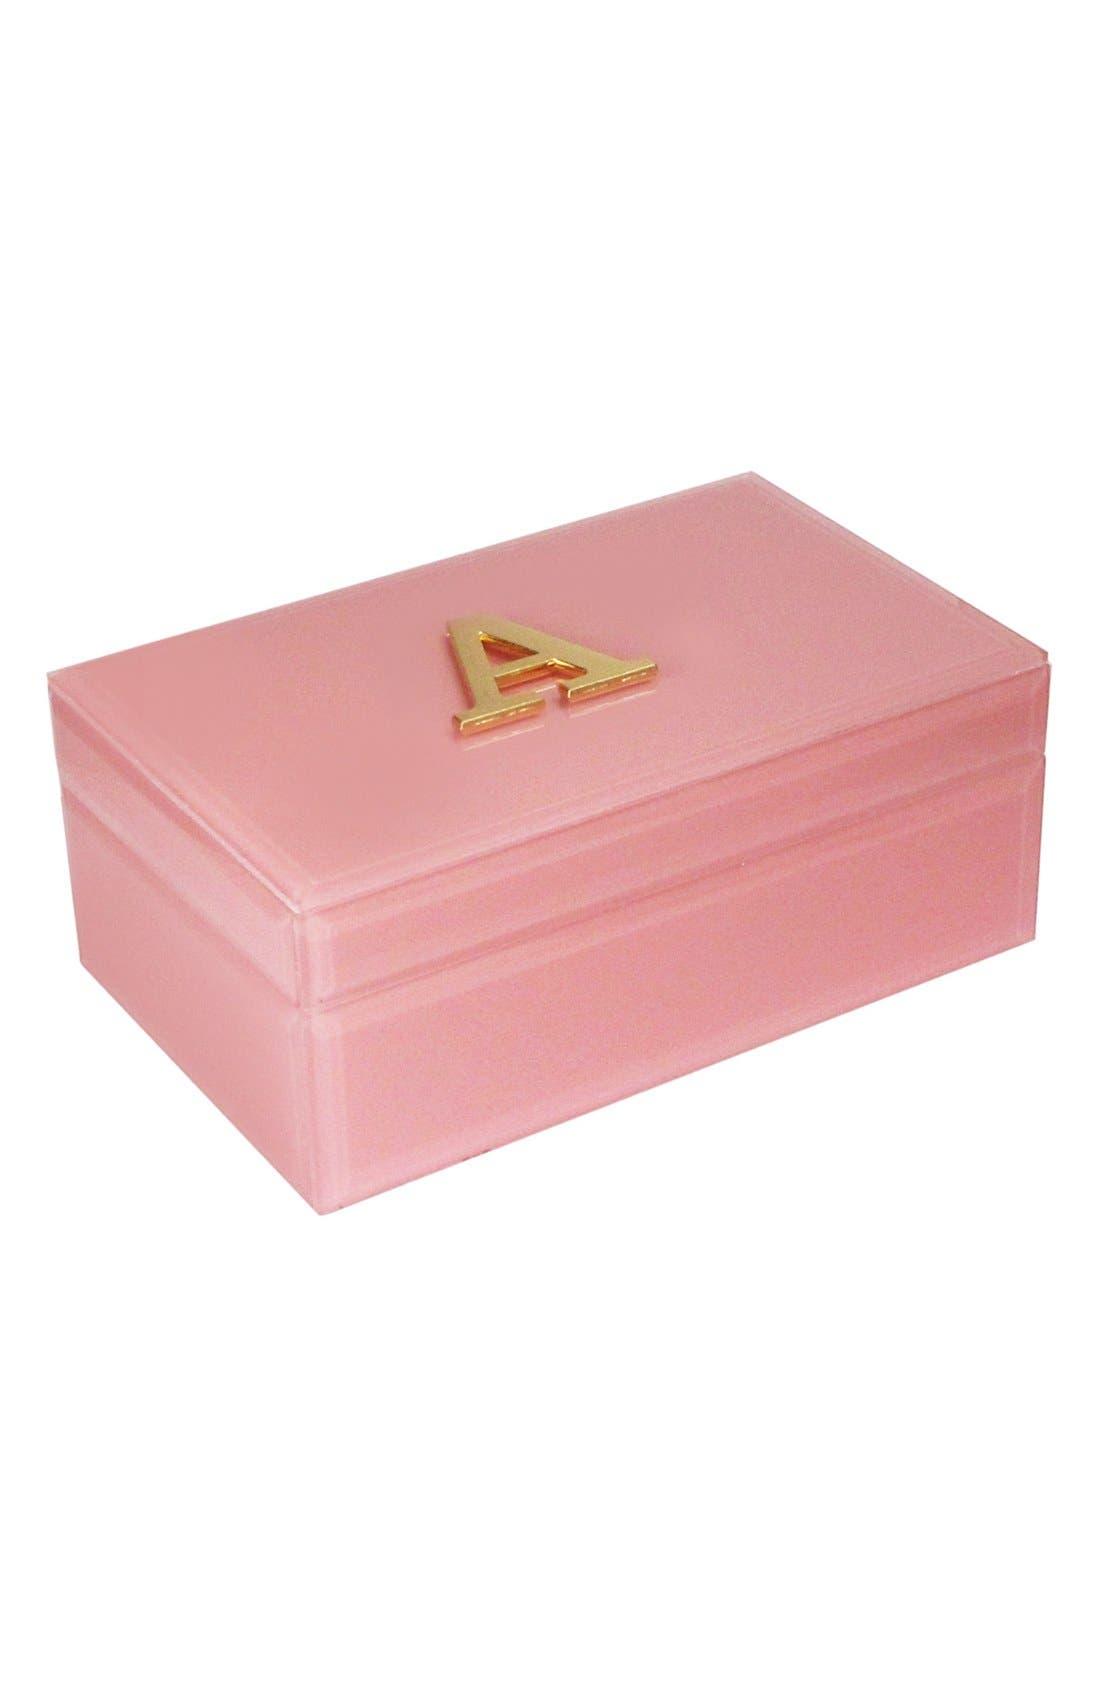 Monogram Jewelry Box,                             Main thumbnail 1, color,                             Rose - A